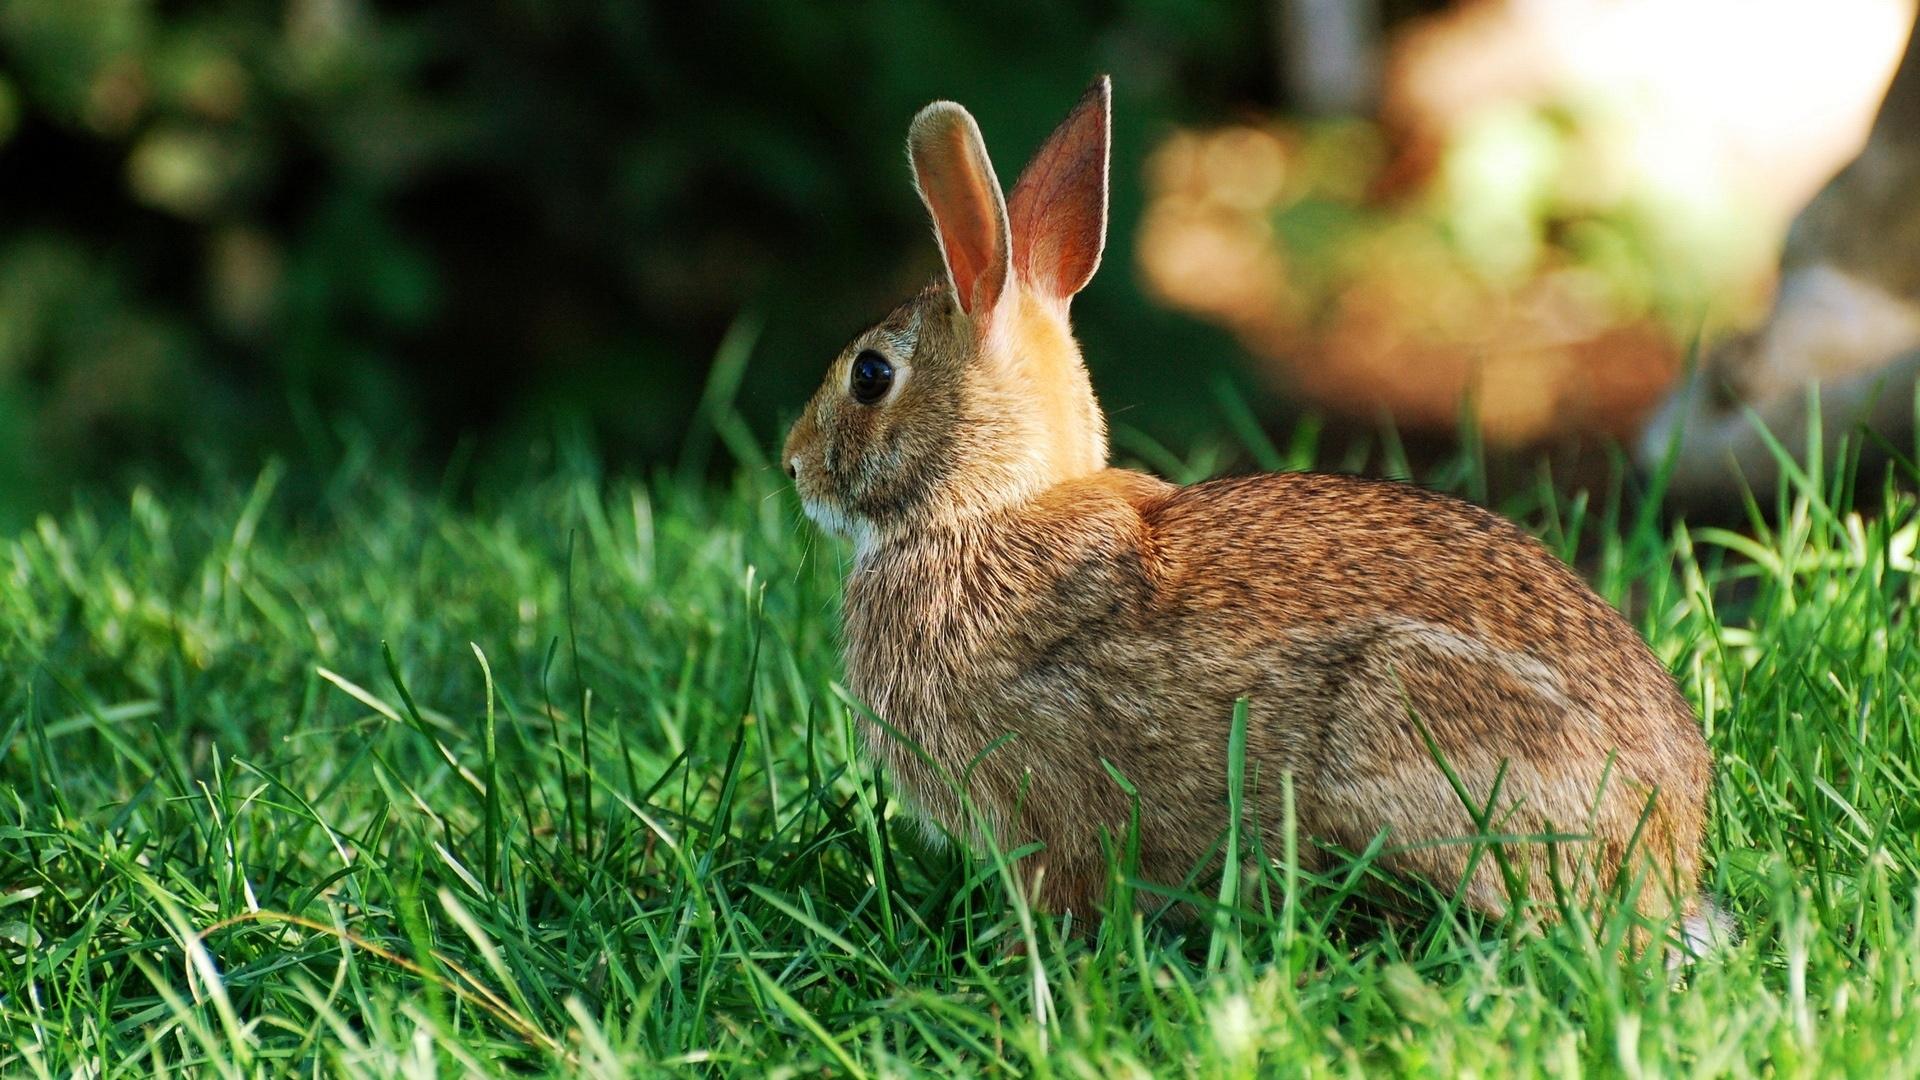 rabbit hd image